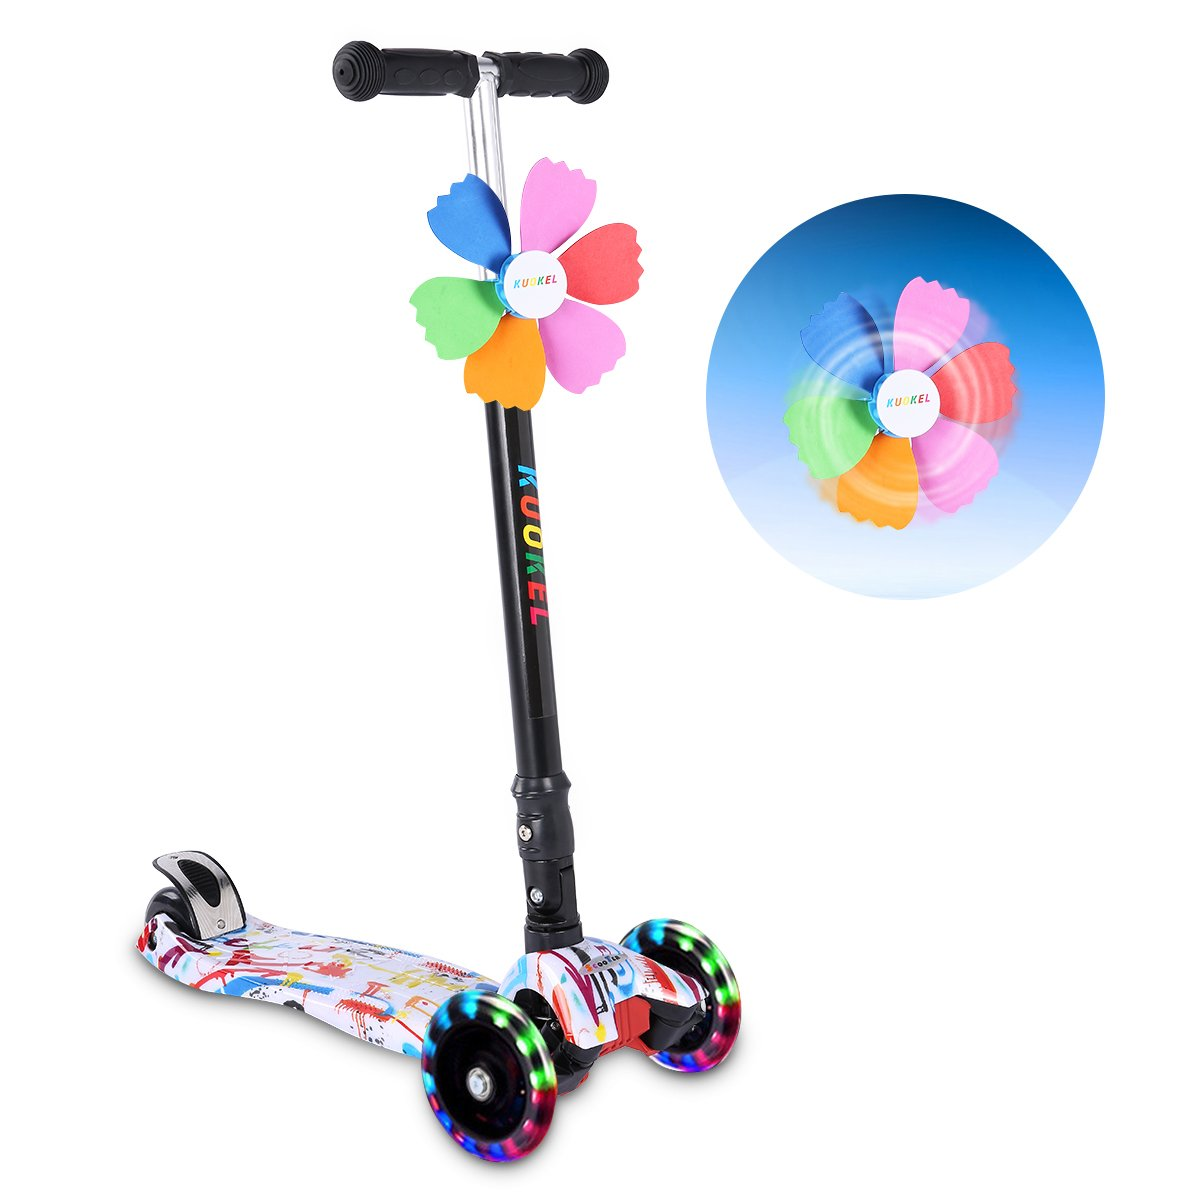 KUOKEL Children Folding Kick Scooters Age 4-10 Flashing PU Wheels 3 Wheel Adjustable Height Handle with Mini Winnower Black